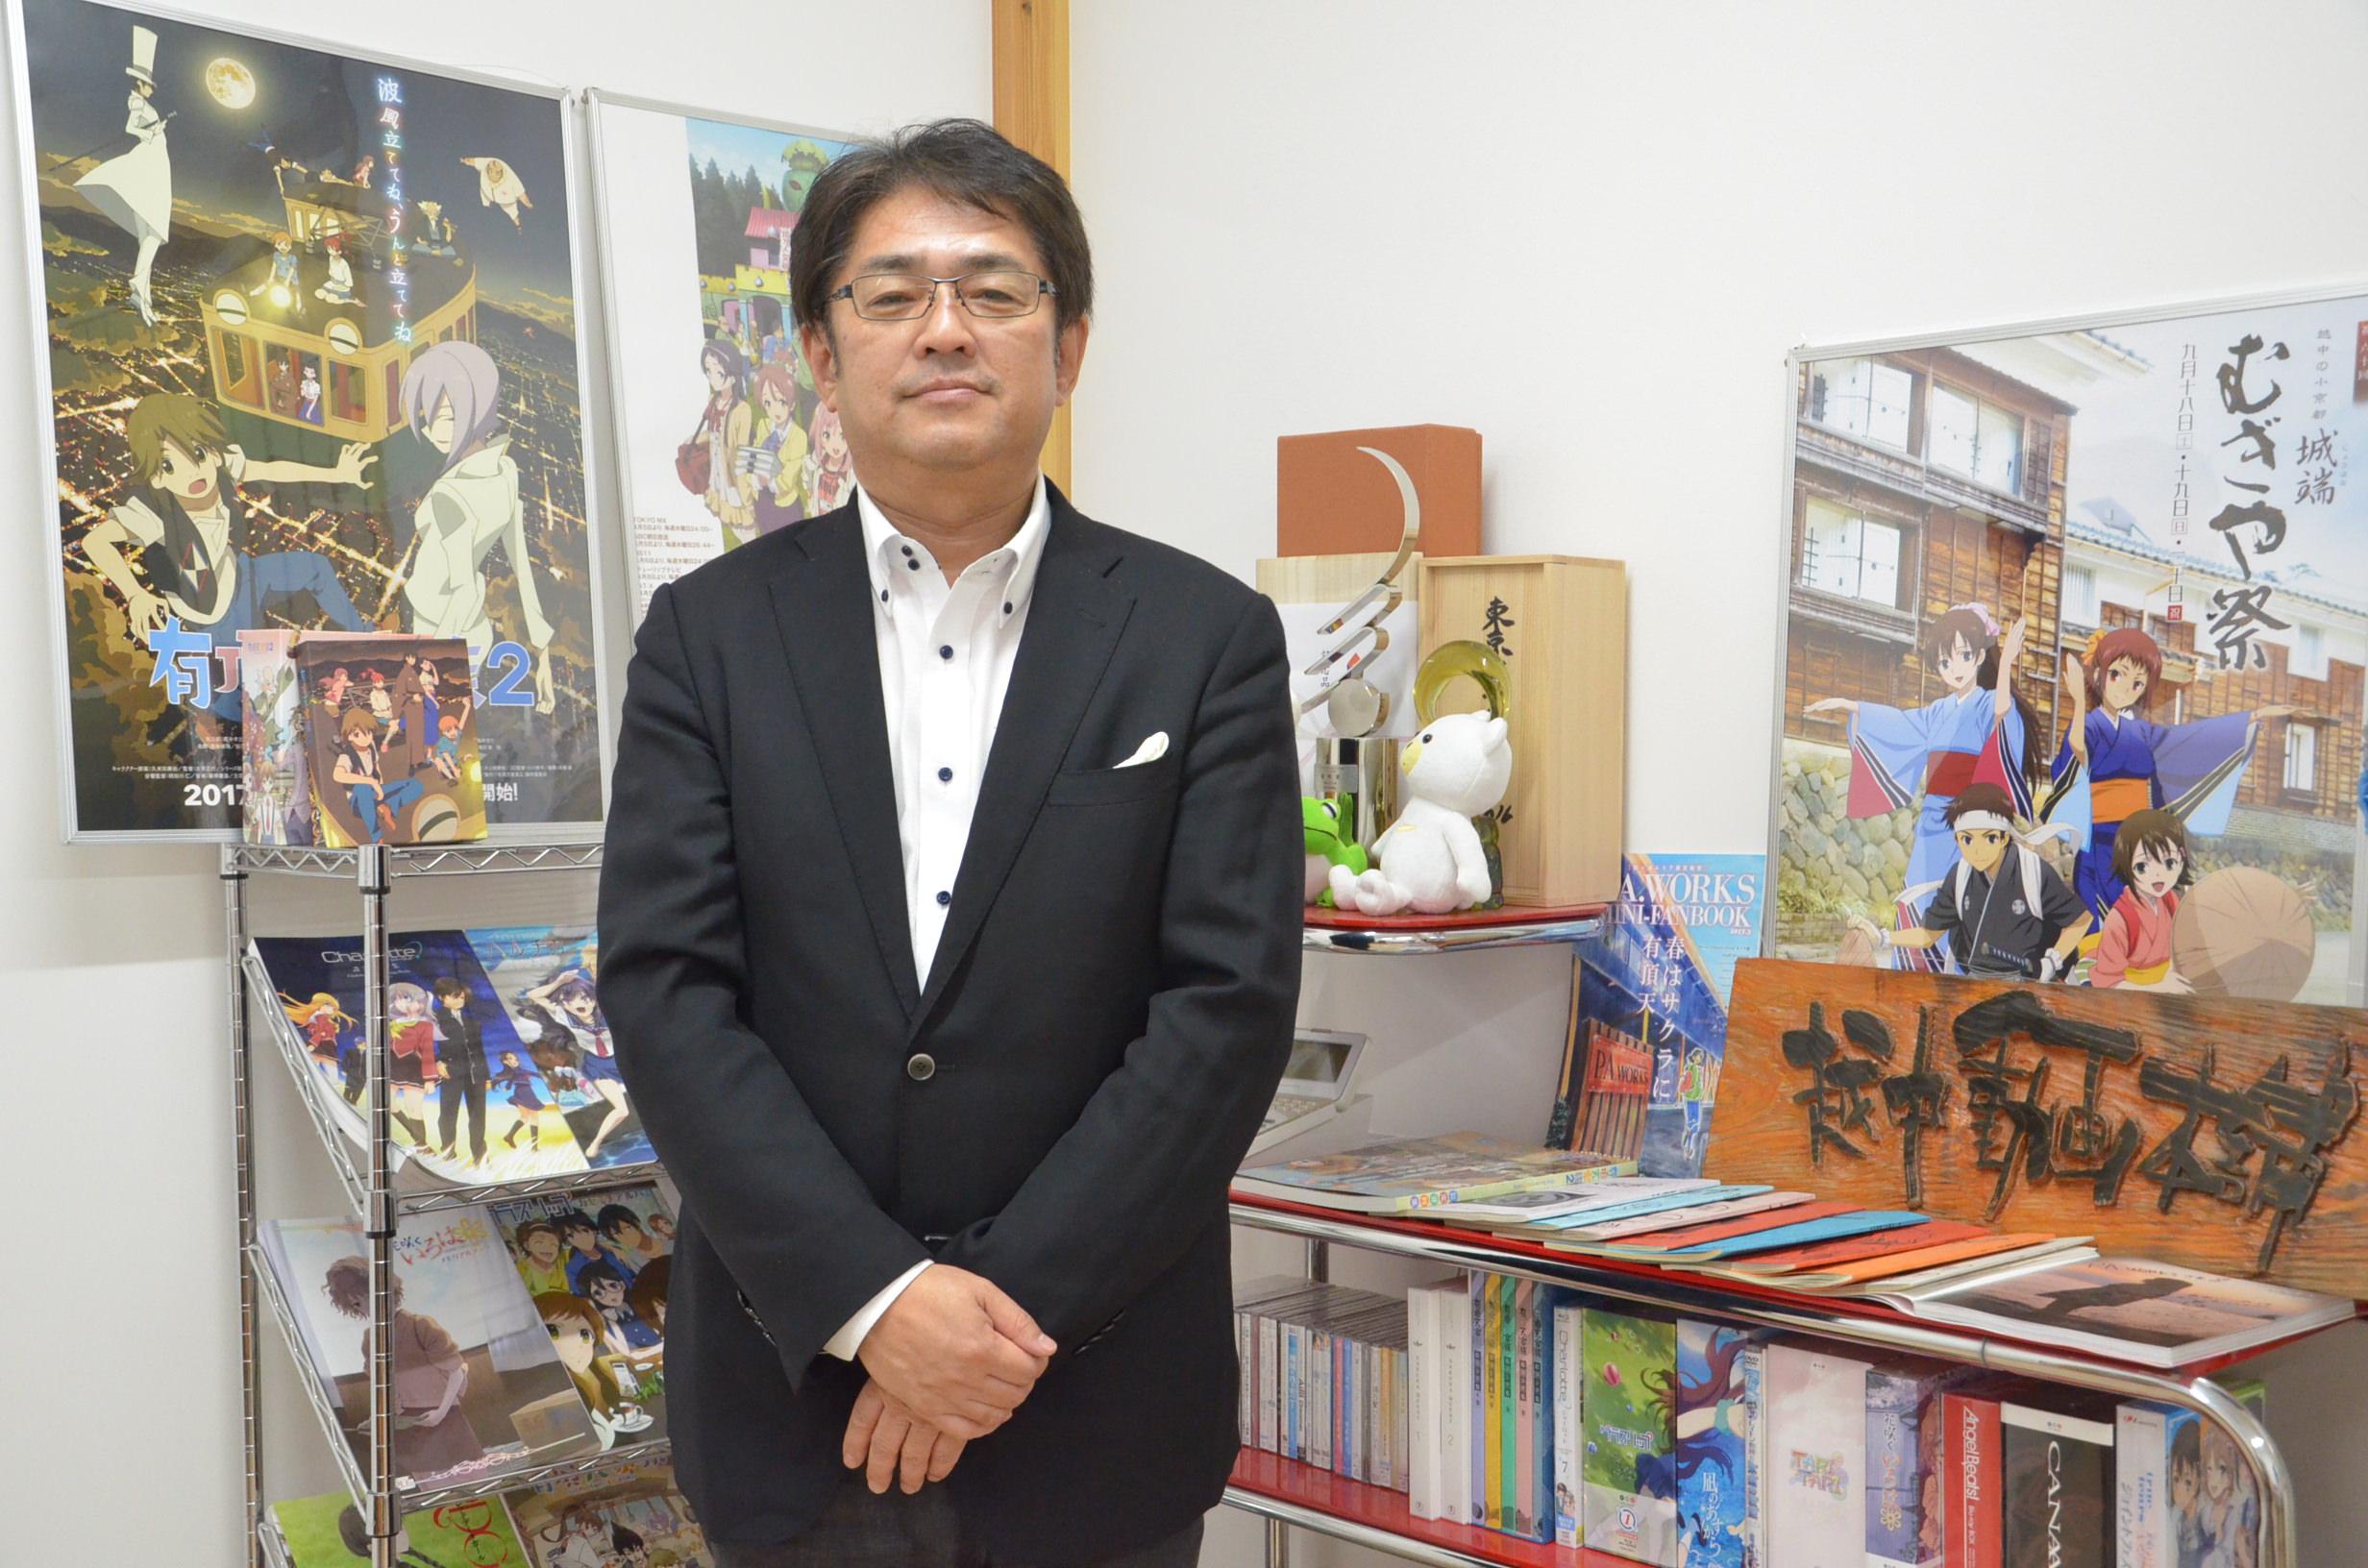 P.A. WORKS専務取締役・一般社団法人PARUS 代表理事 菊池宣広さん